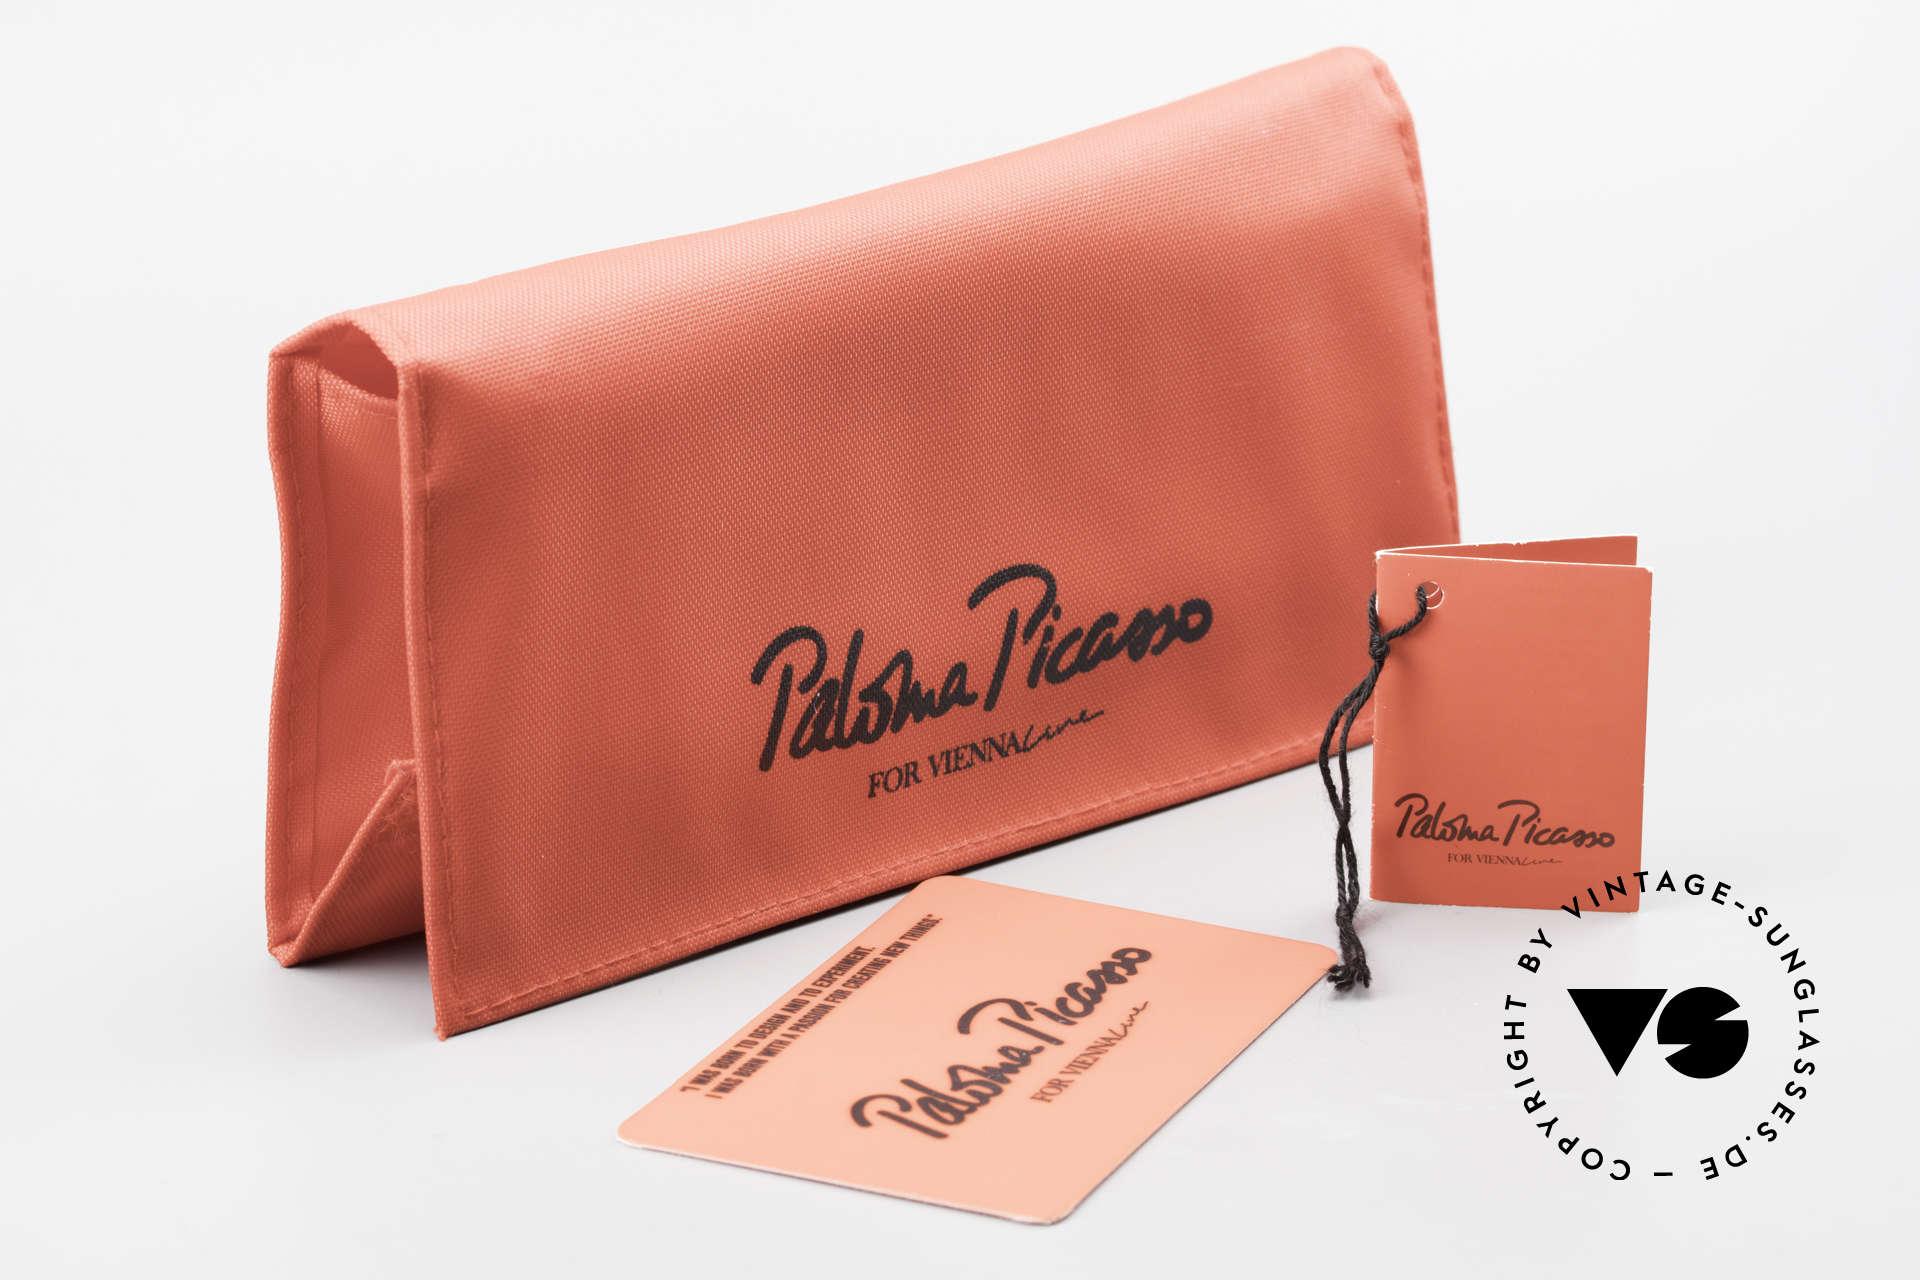 Paloma Picasso 3707 90s Shades Crystal Rhinestones, Size: medium, Made for Women